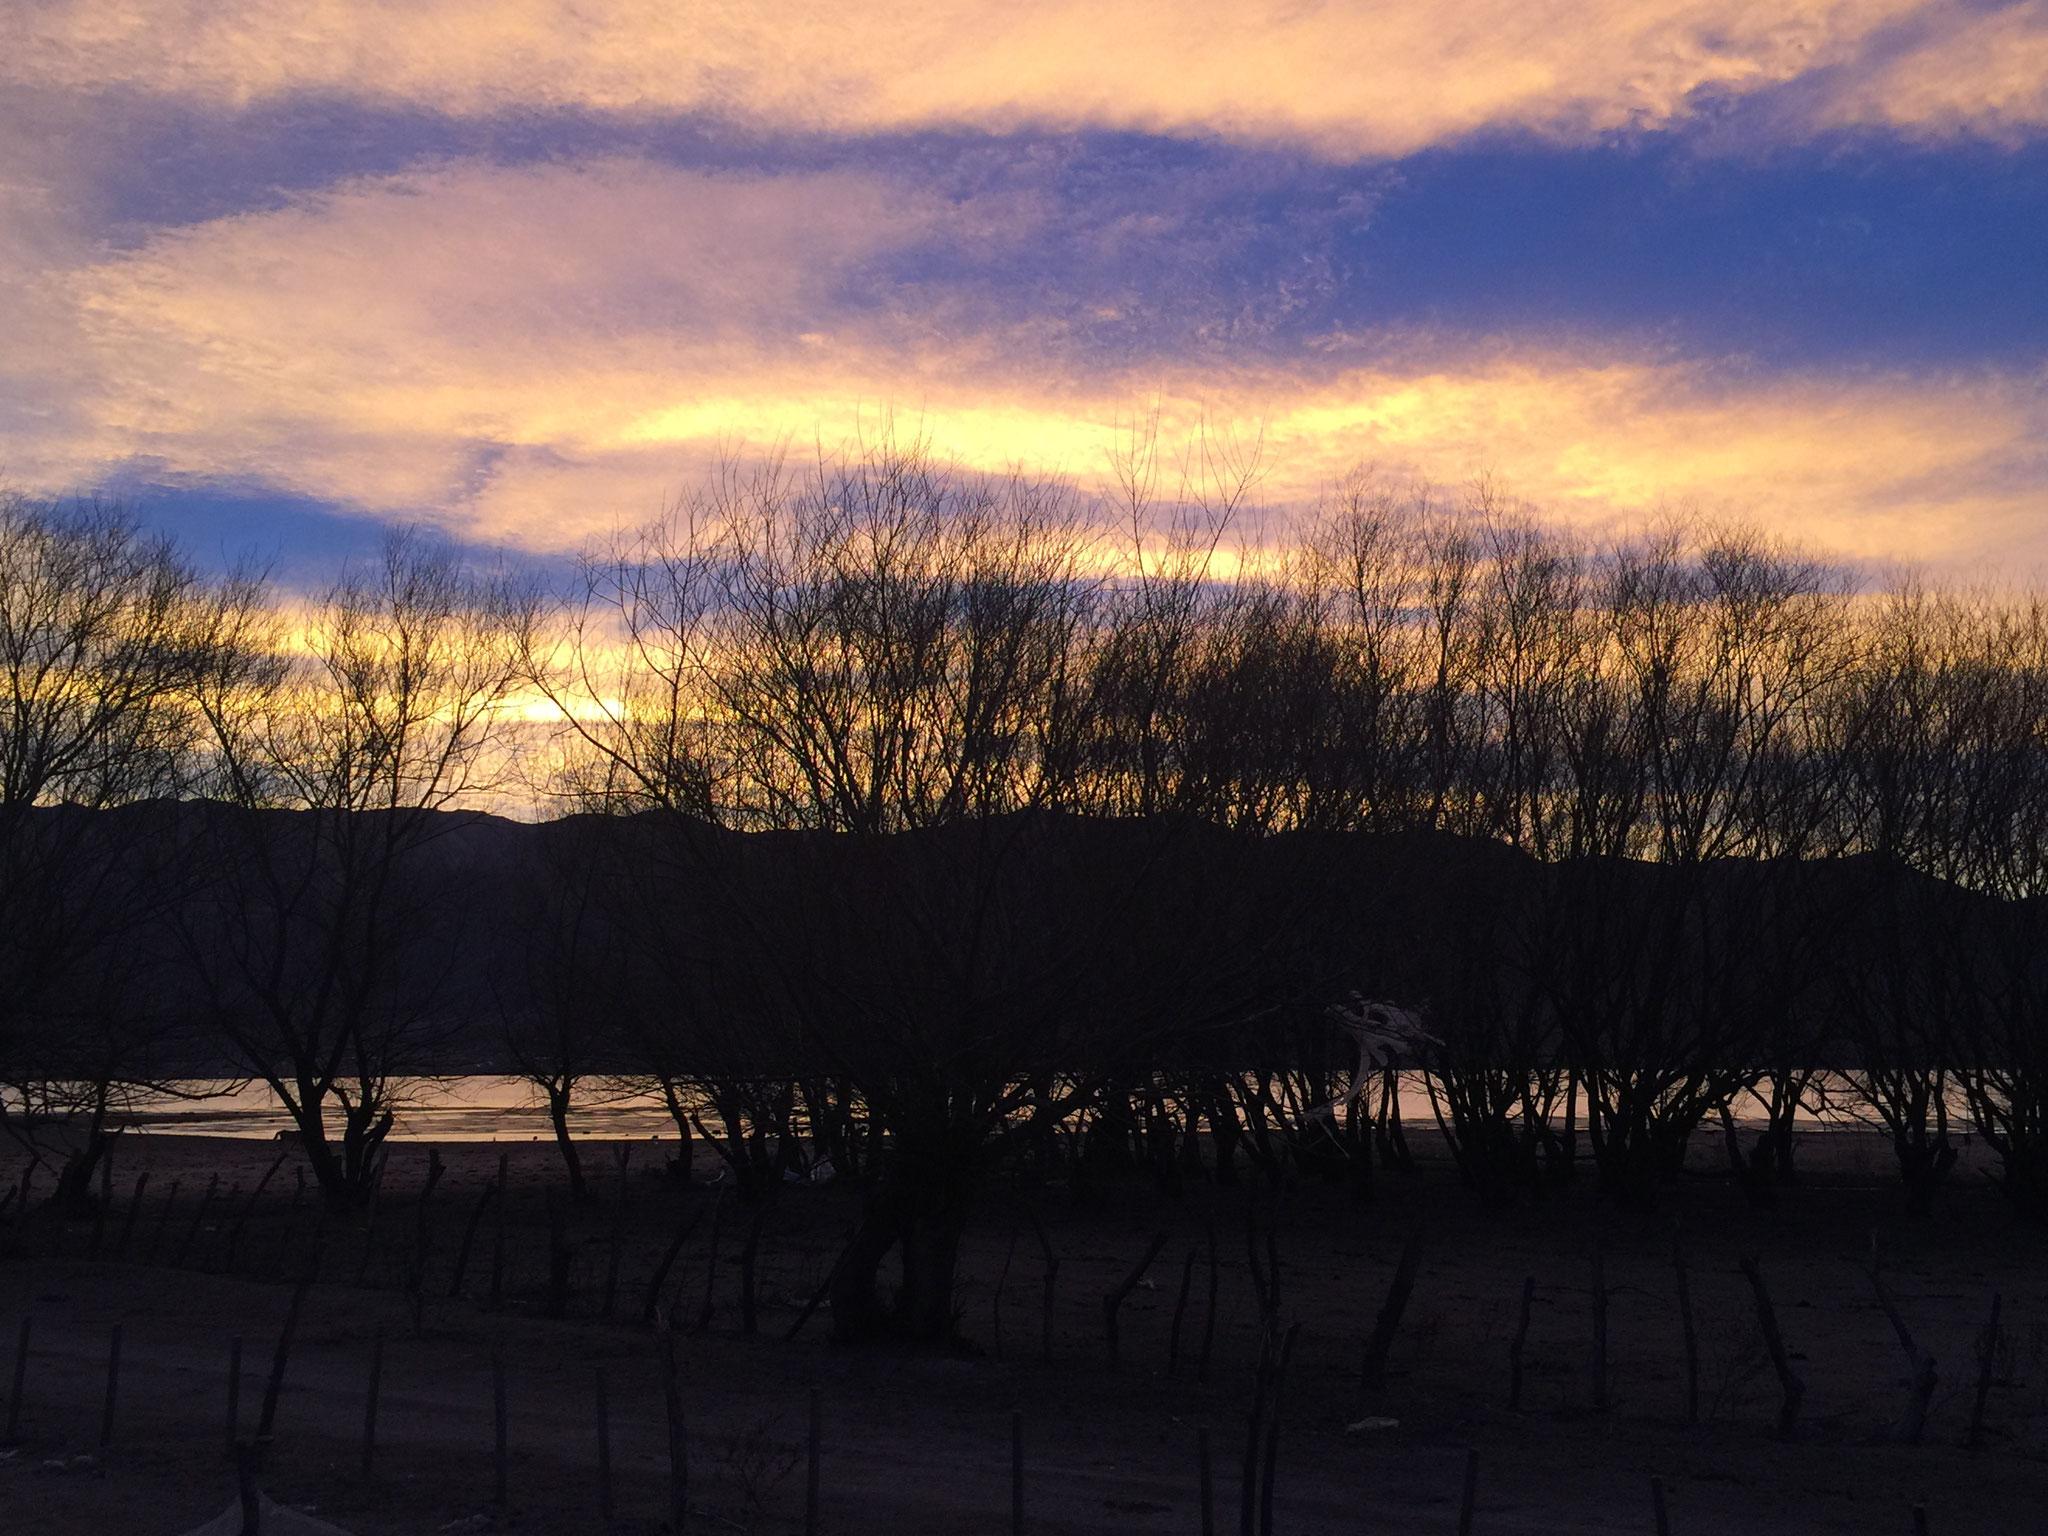 und traumhaftem Sonnenuntergang!